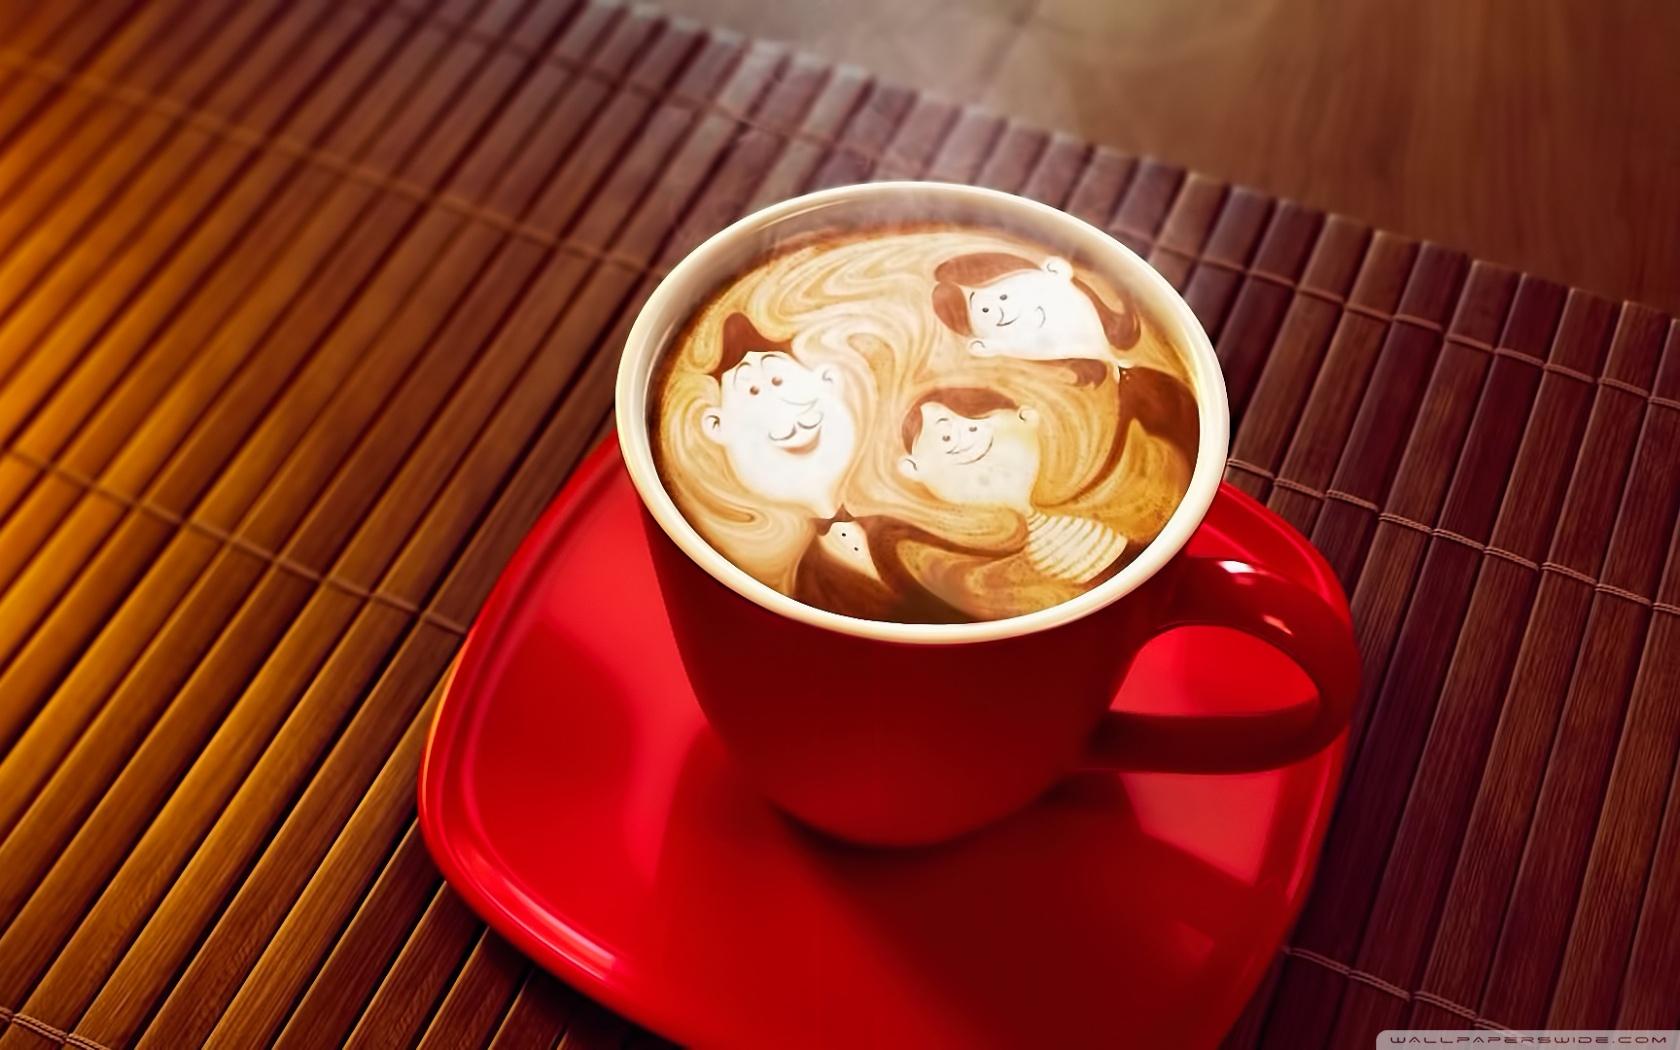 coffee_cup_5-wallpaper-1680x1050.jpg